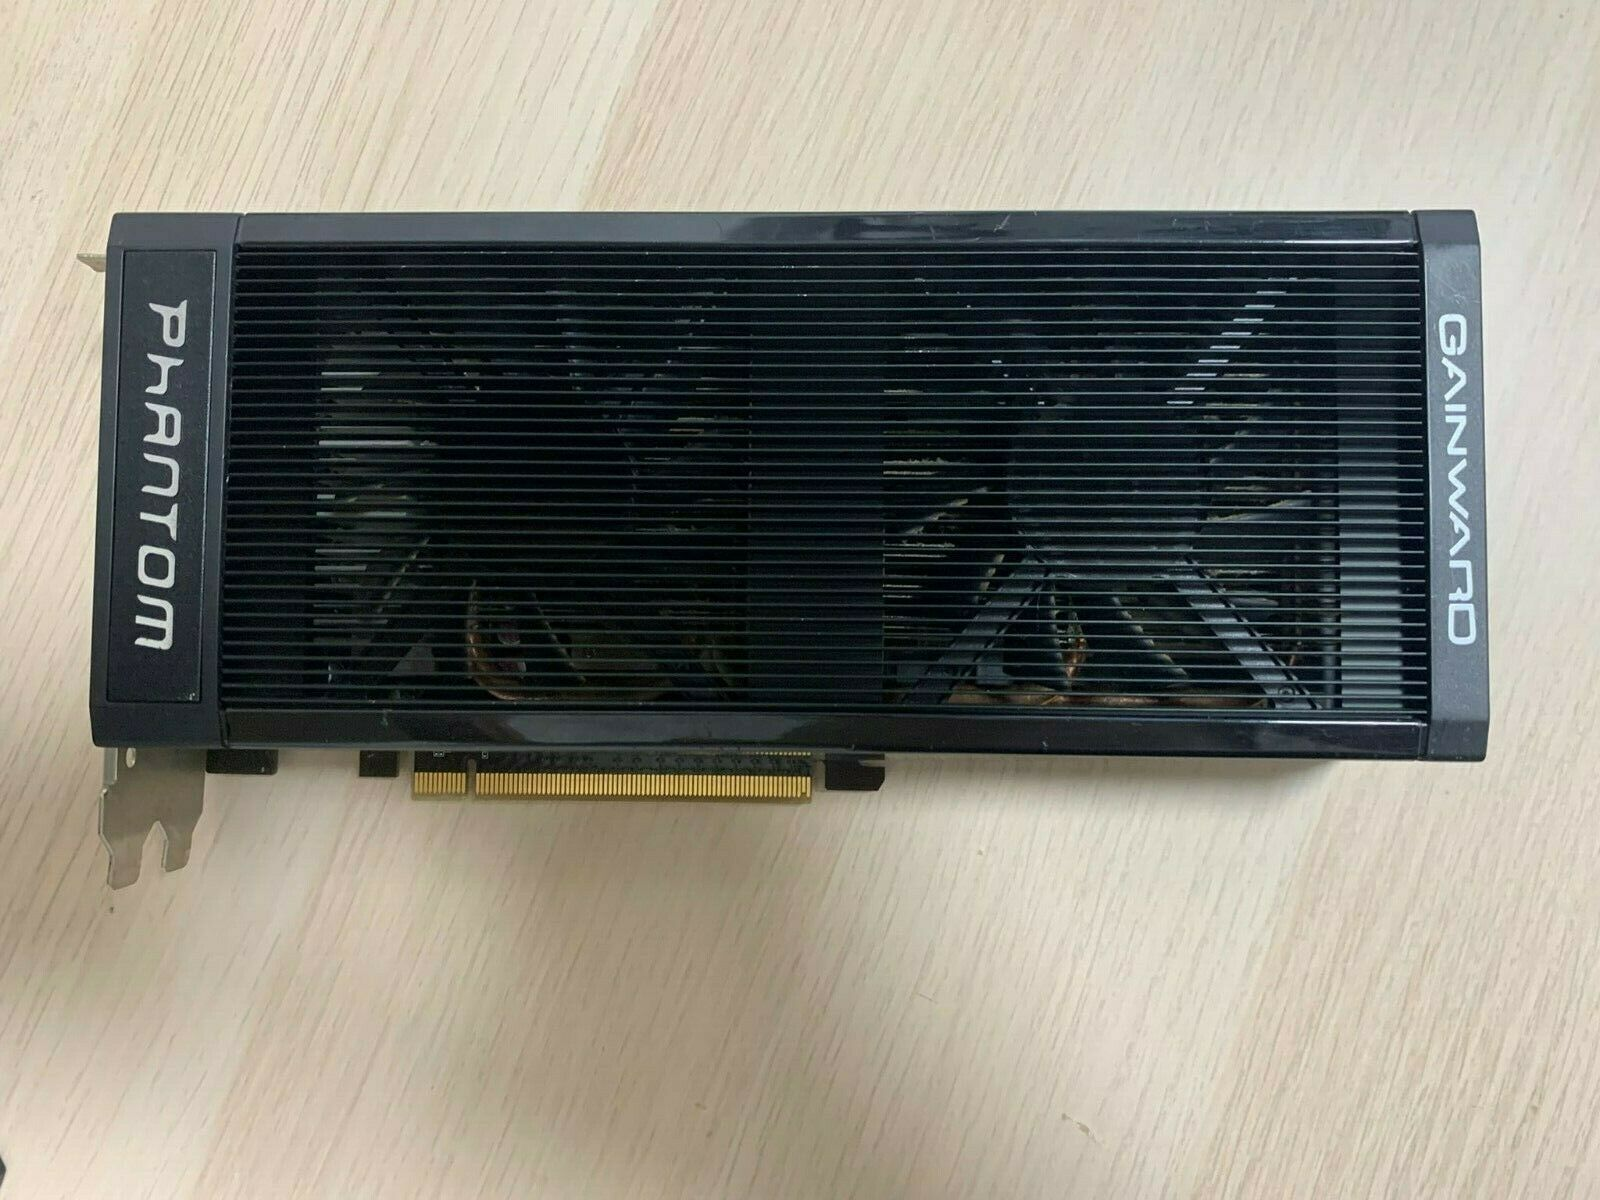 Gainward Phantom Graphics Card GeForce GTX760 4GB GDDR5 - FREE SHIPPING